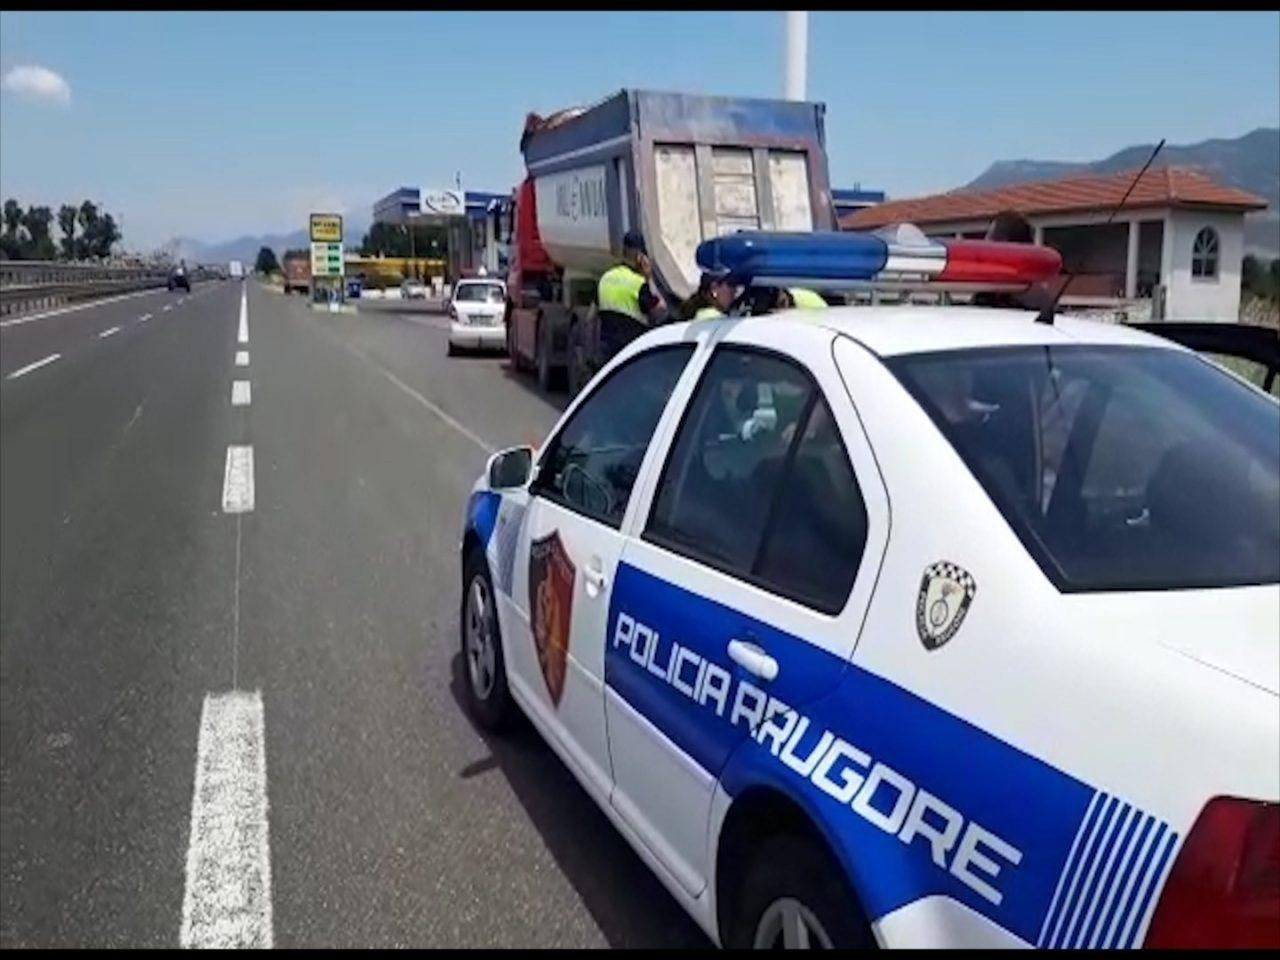 policia-rrugore-1280x960.jpg